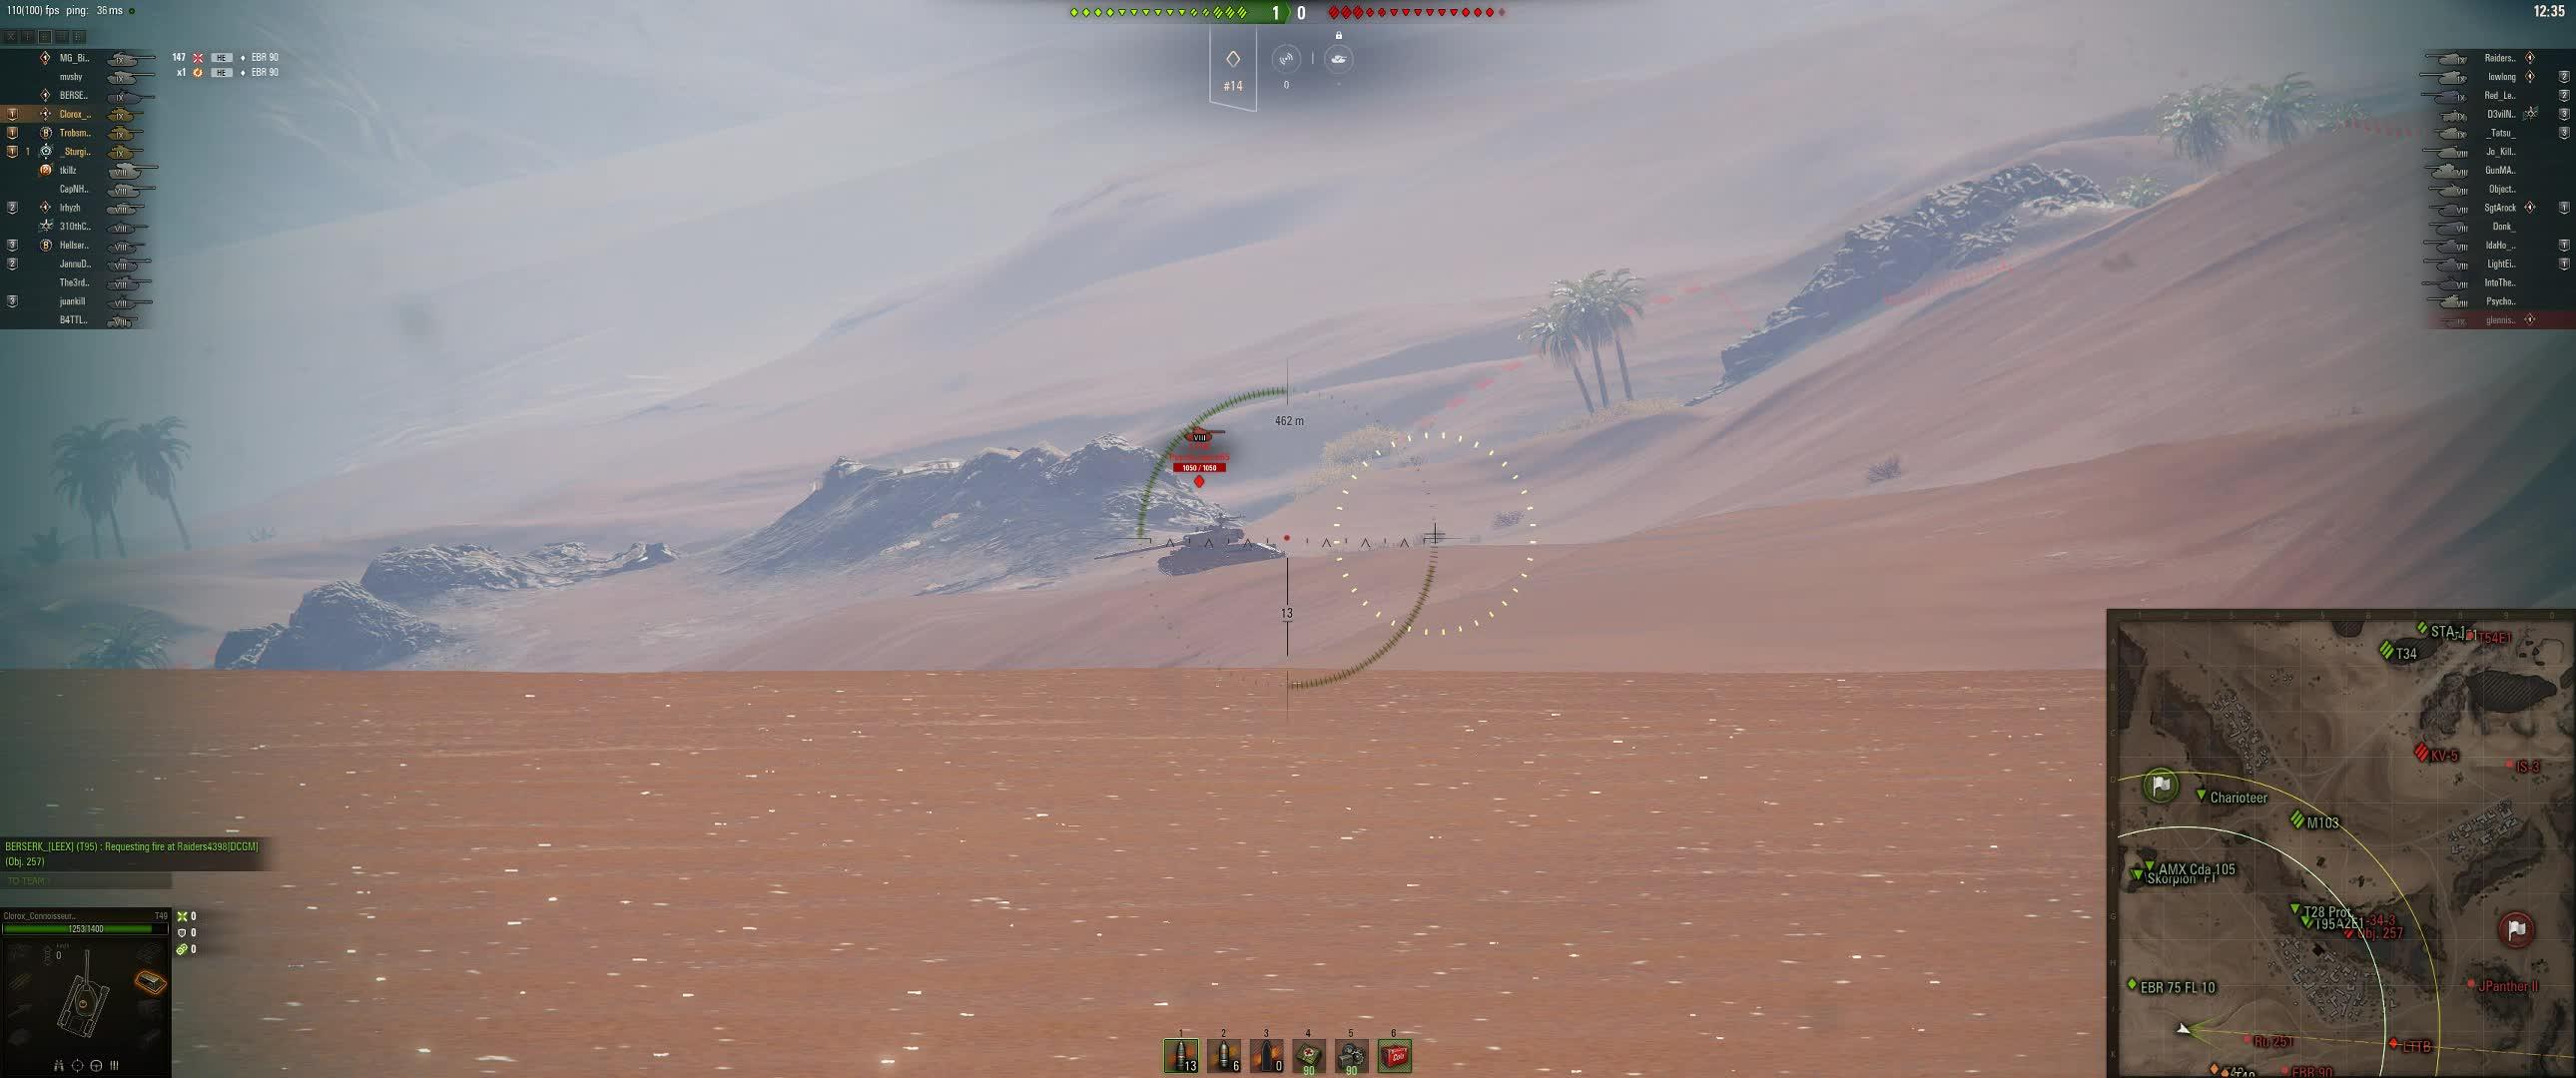 t49, world of tanks, Woah, sick drift dude GIFs